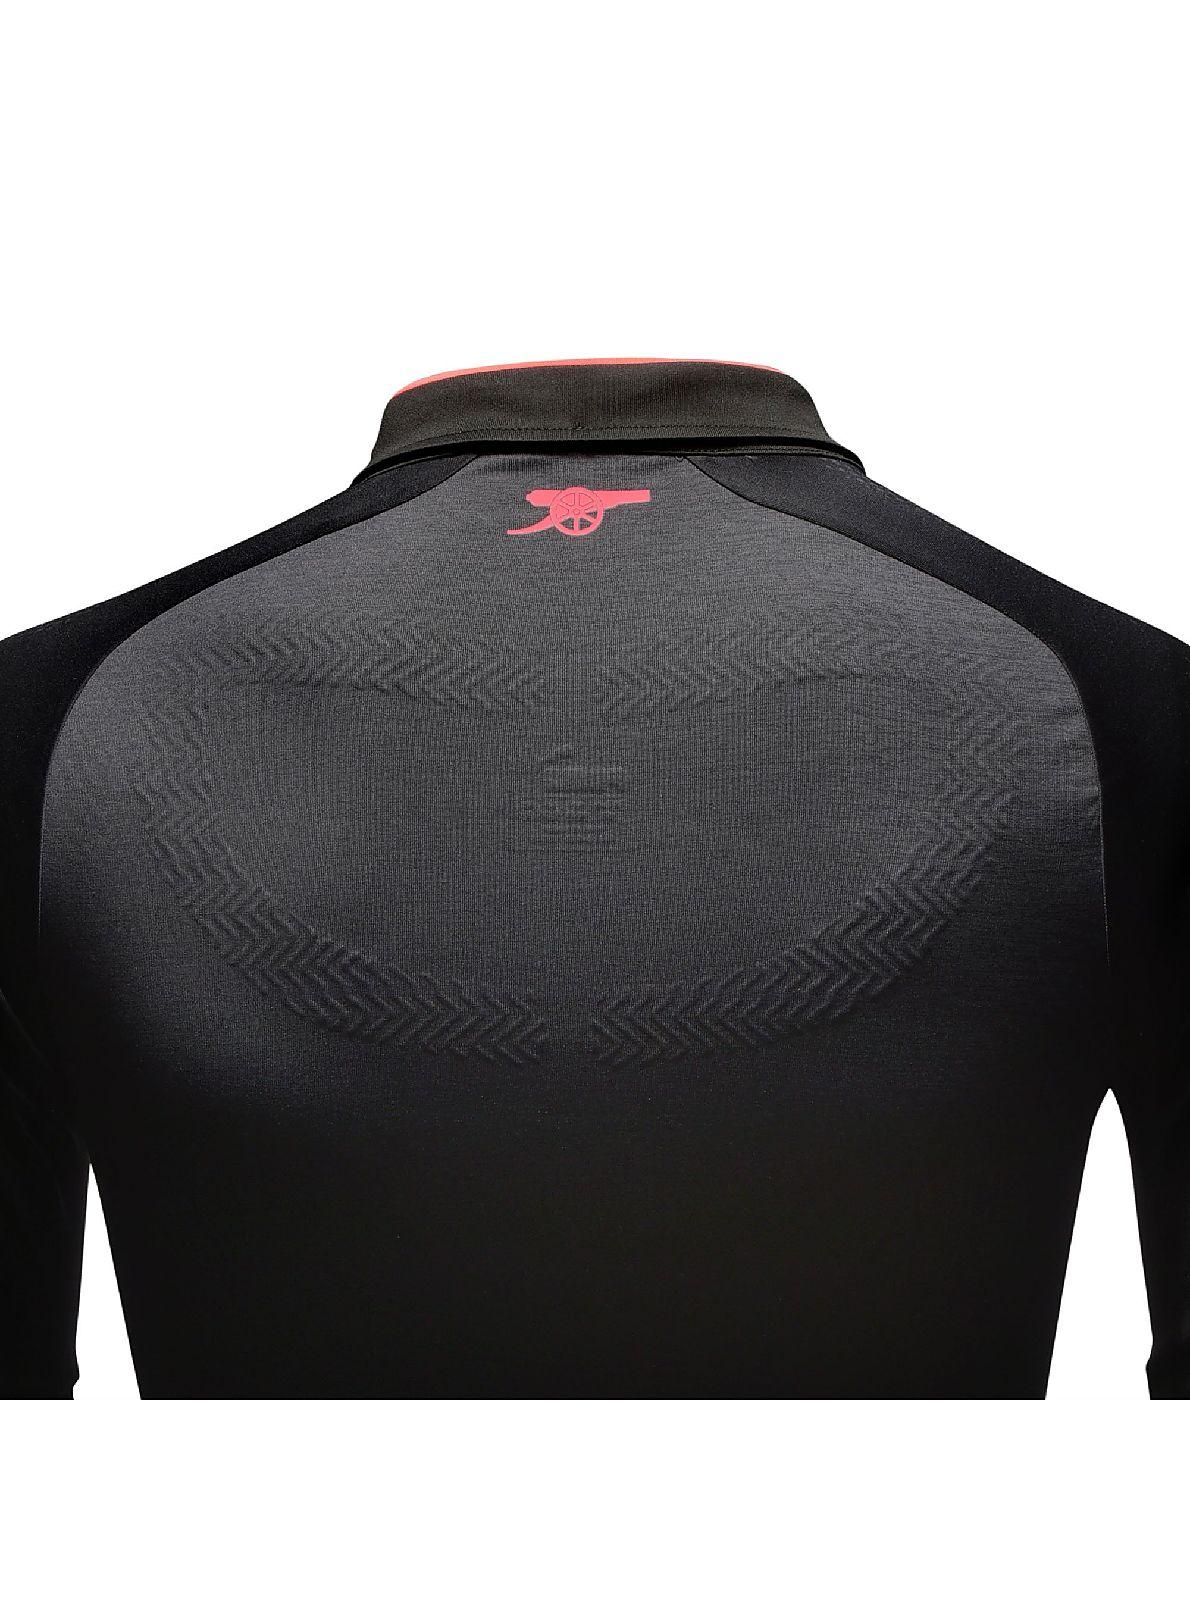 quality design bb4ec 4a7e7 Arsenal 17/18 Puma Third Kit   17/18 Kits   Football shirt blog